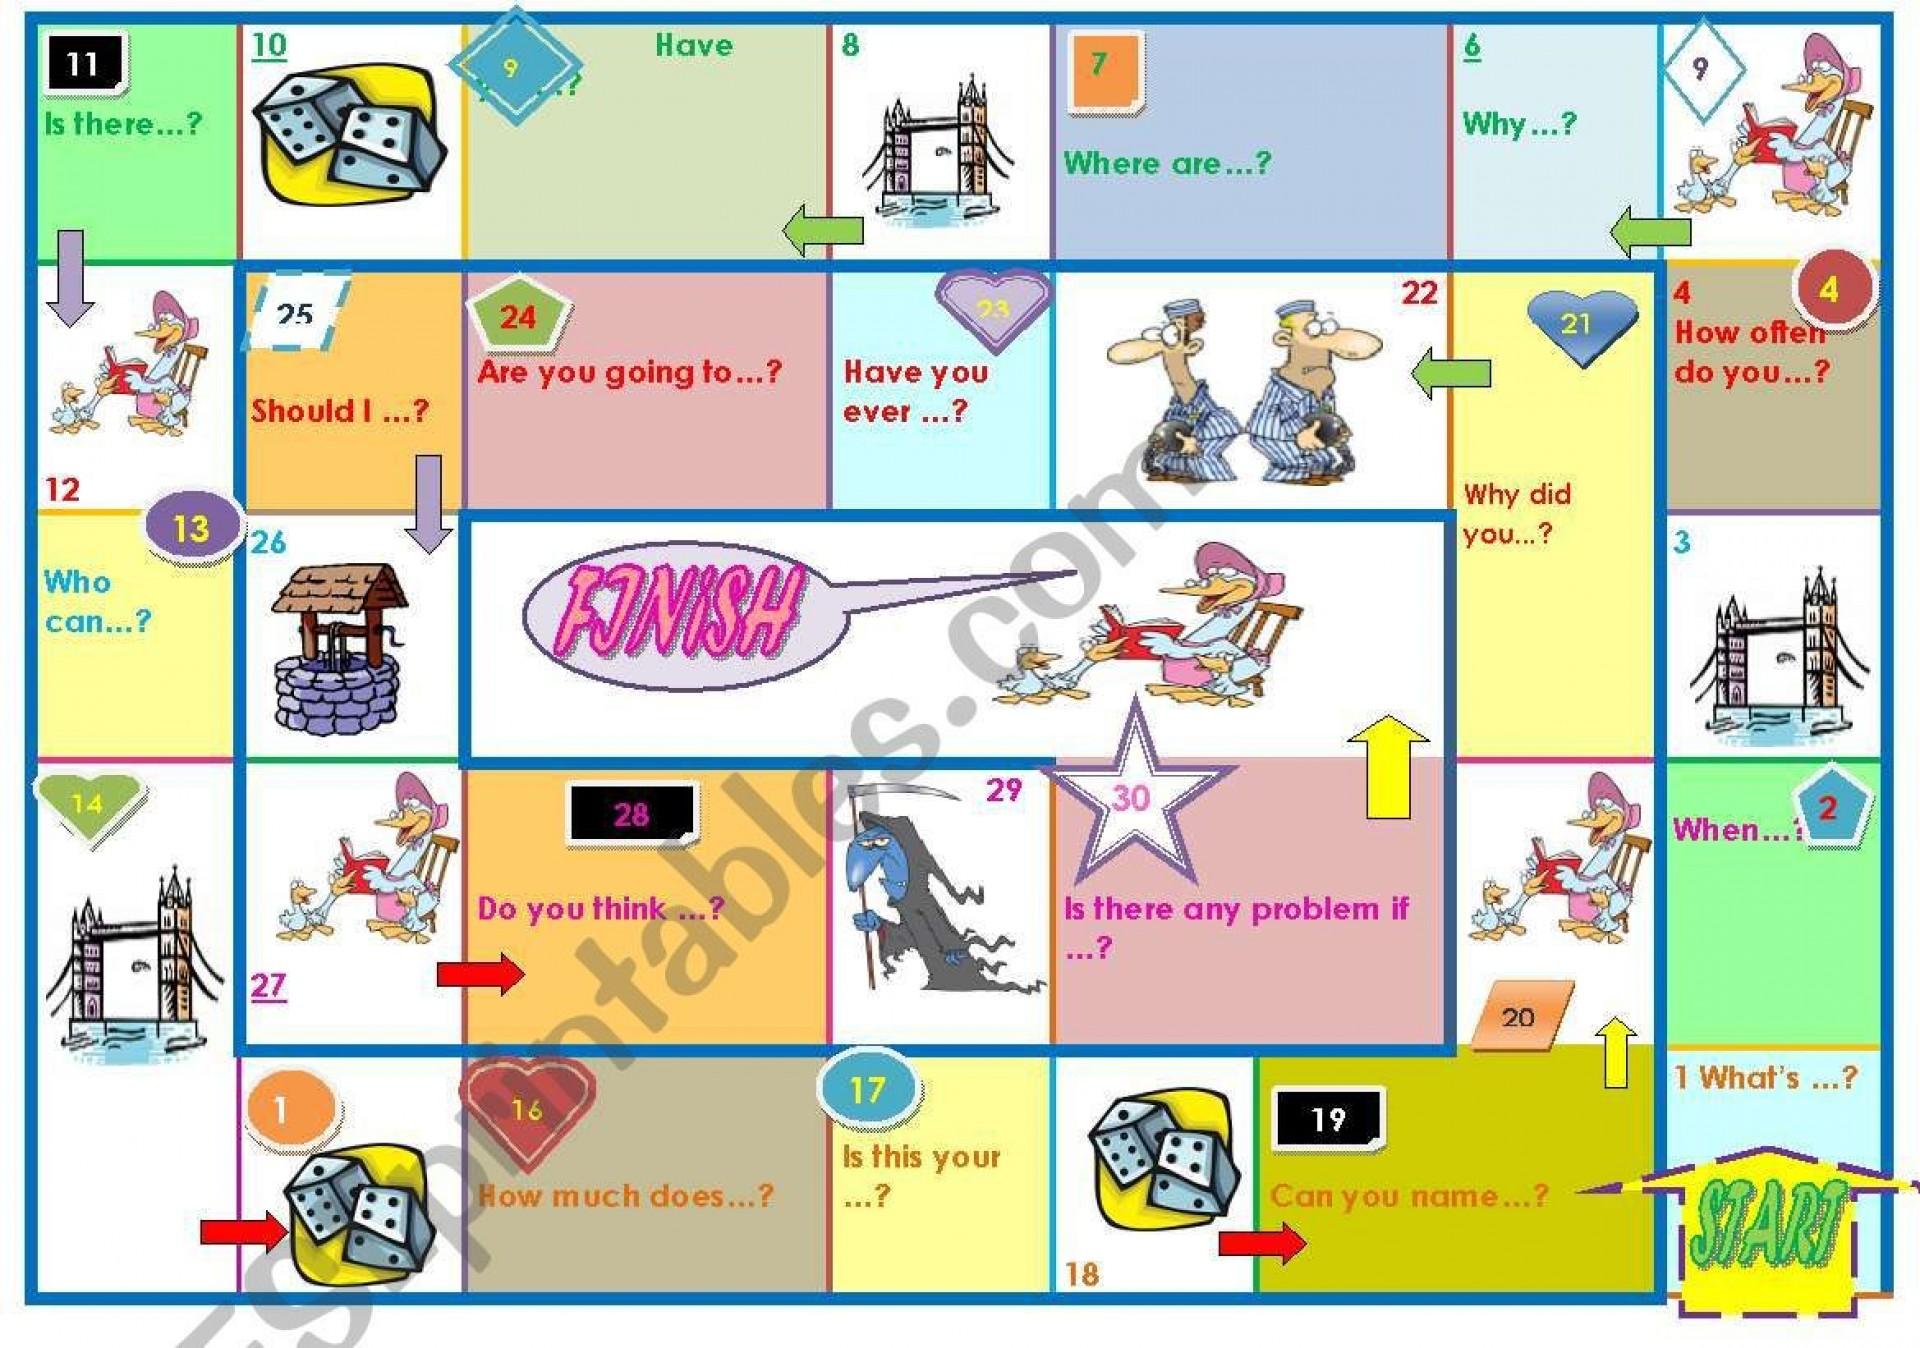 002 Shocking Editable Board Game Template Photo  Word Blank Free1920